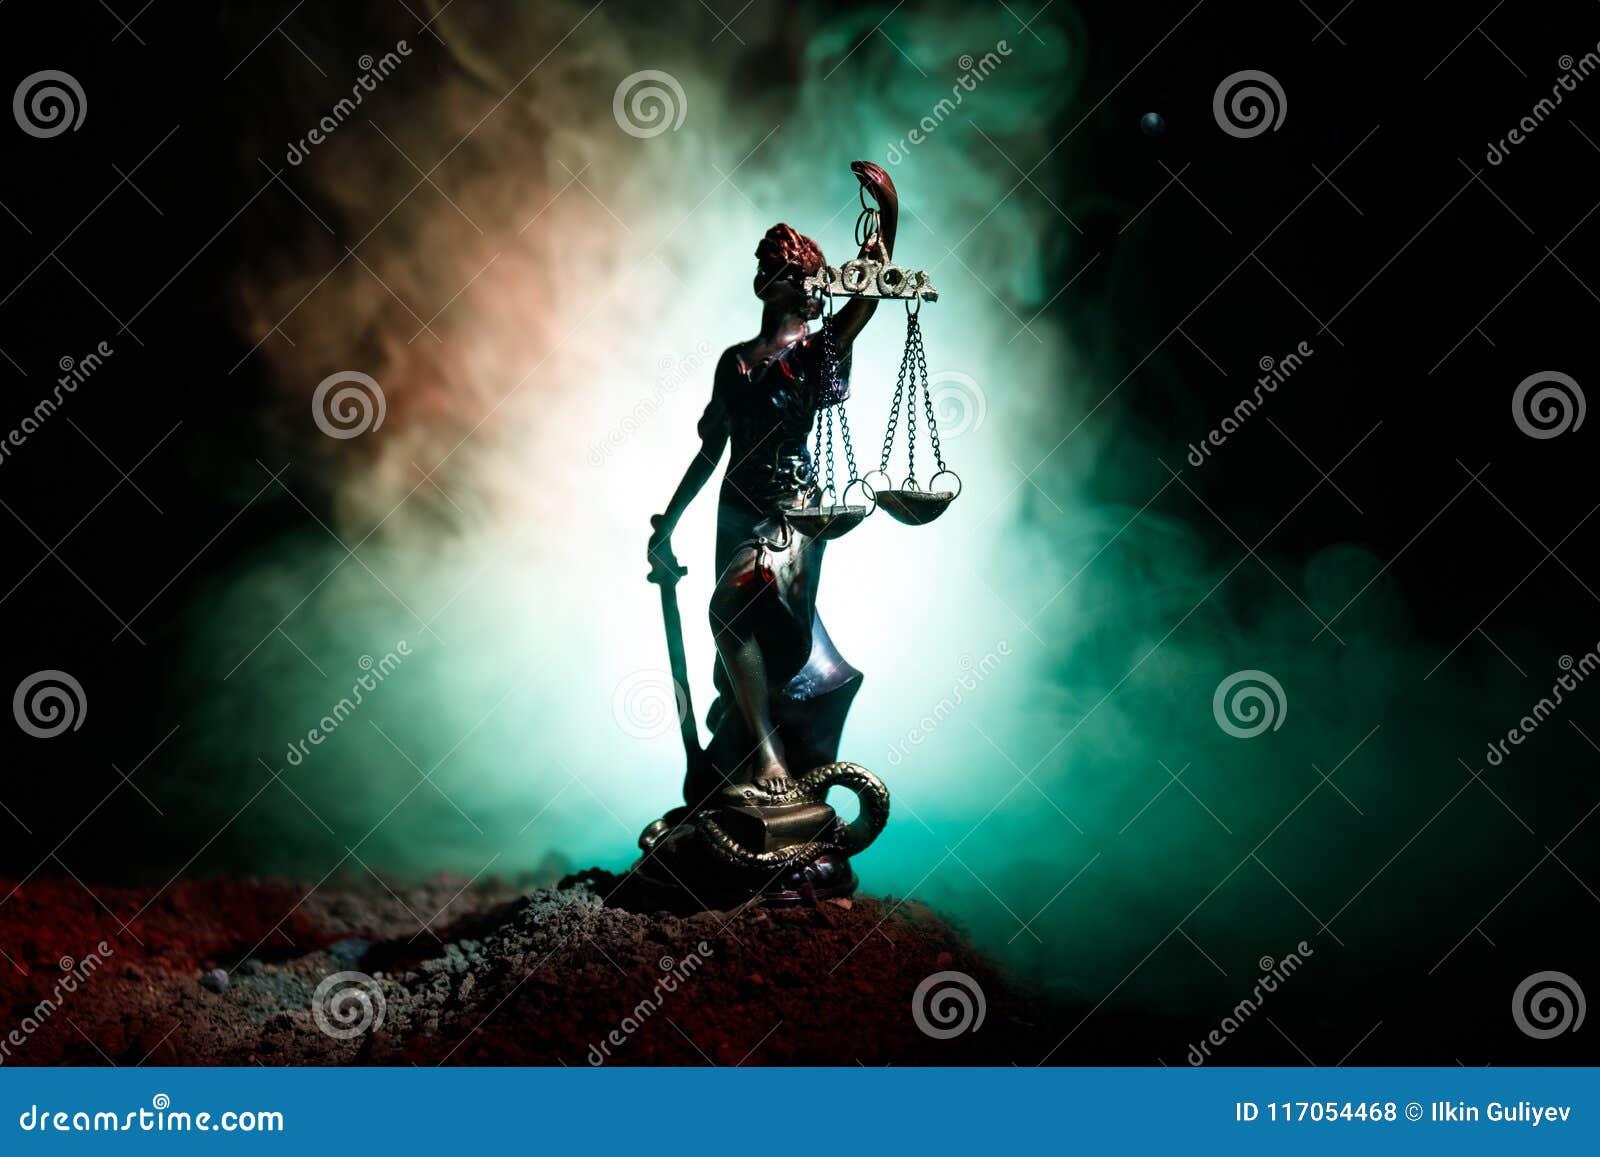 La statue de la justice - justice ou Iustitia/Justitia de dame la déesse romaine de la justice sur un fond foncé du feu